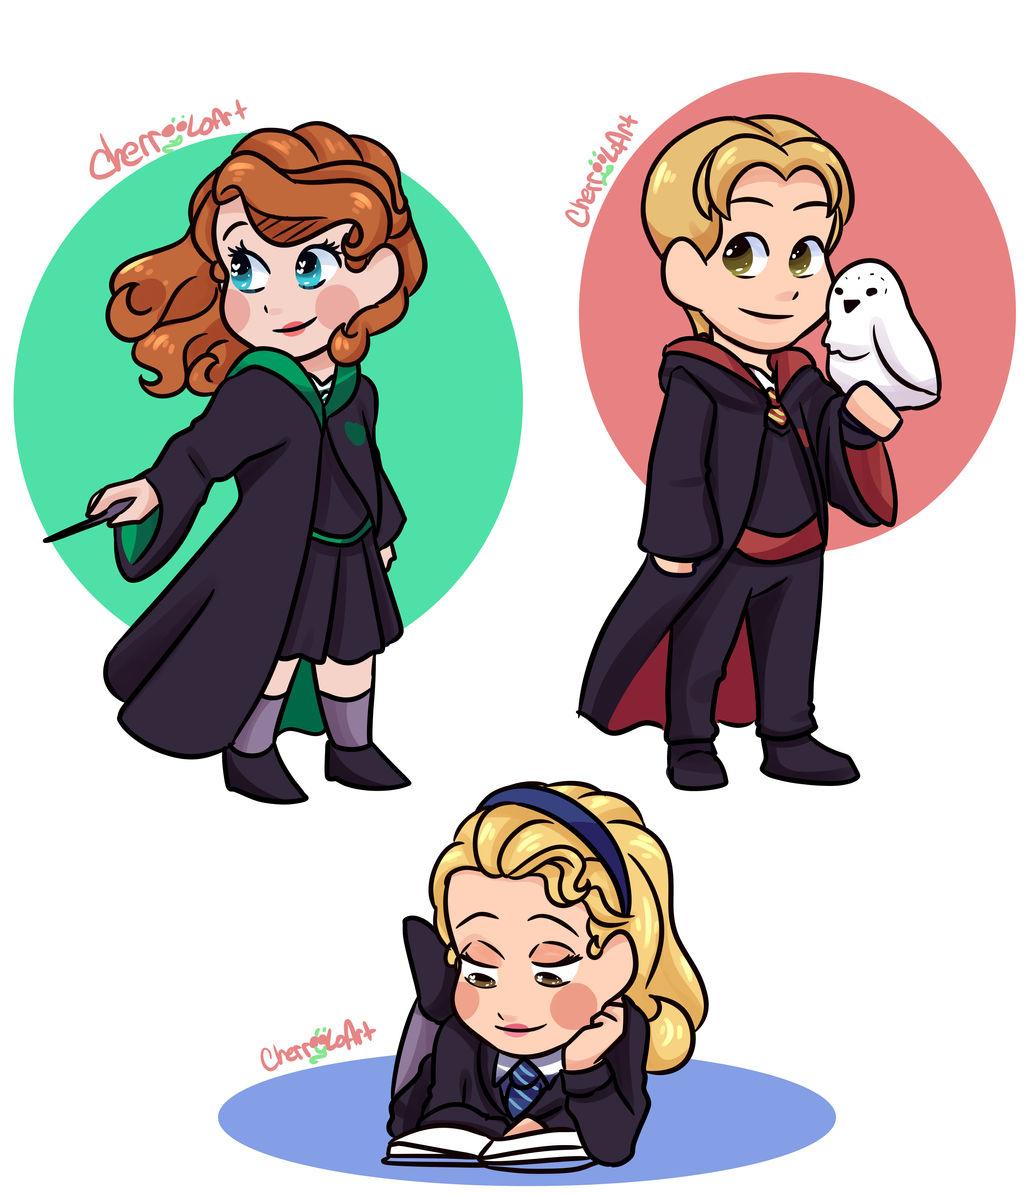 Sofia the First Harry Potter Au by CherryLoArt on DeviantArt